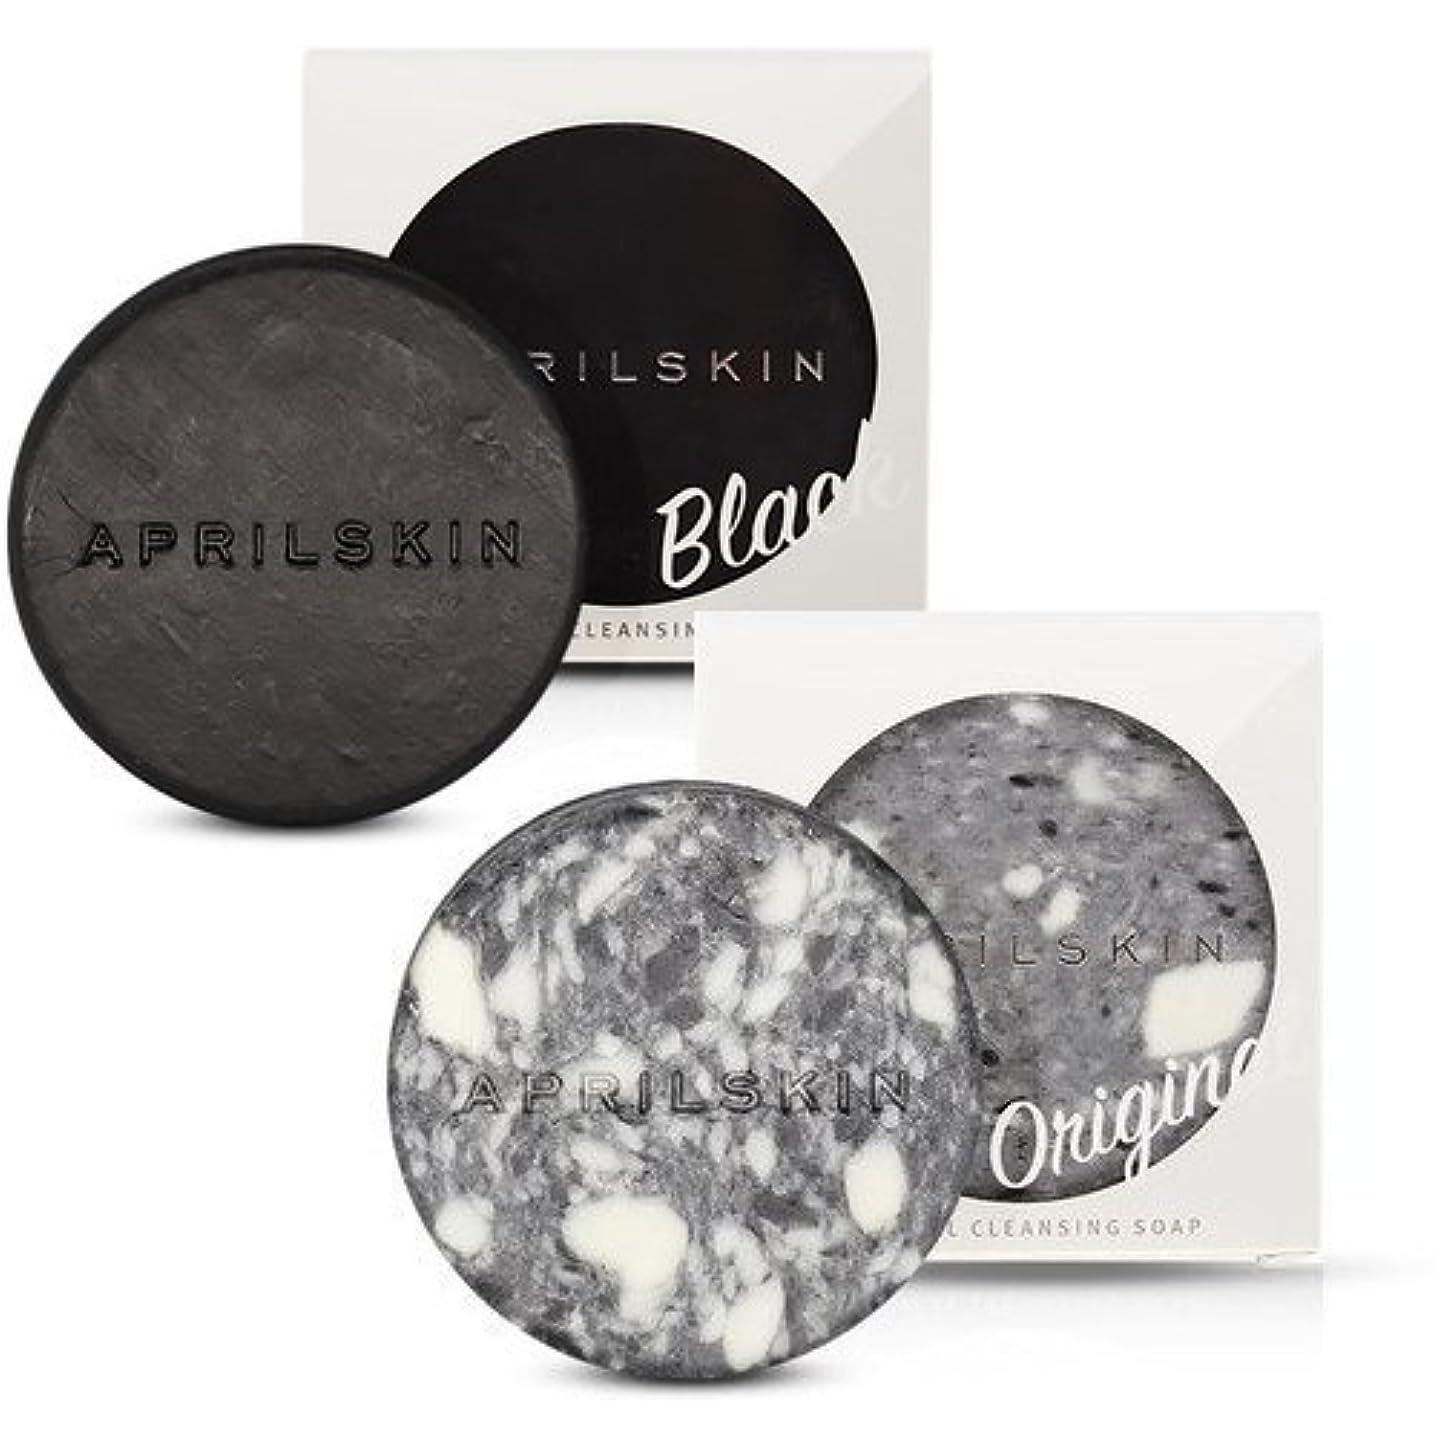 [1+1][APRILSKIN] エイプリルスキン国民石鹸 (APRIL SKIN マジックストーンのリニューアルバージョン新発売) (ORIGINAL+BLACK) [並行輸入品]